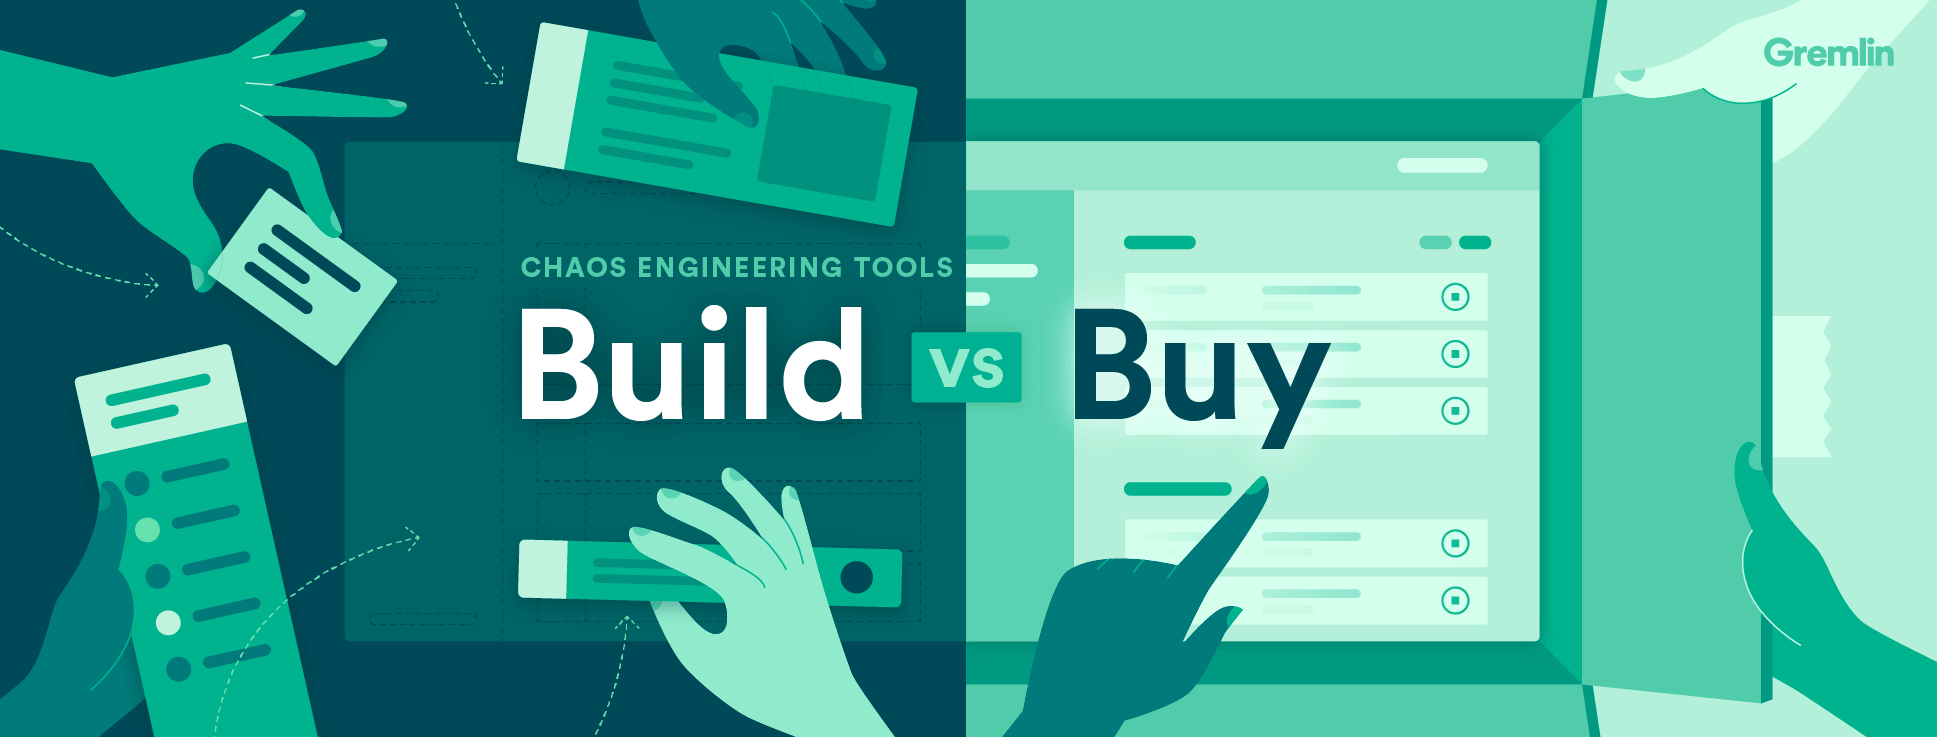 Chaos Engineering Tools: Build vs Buy